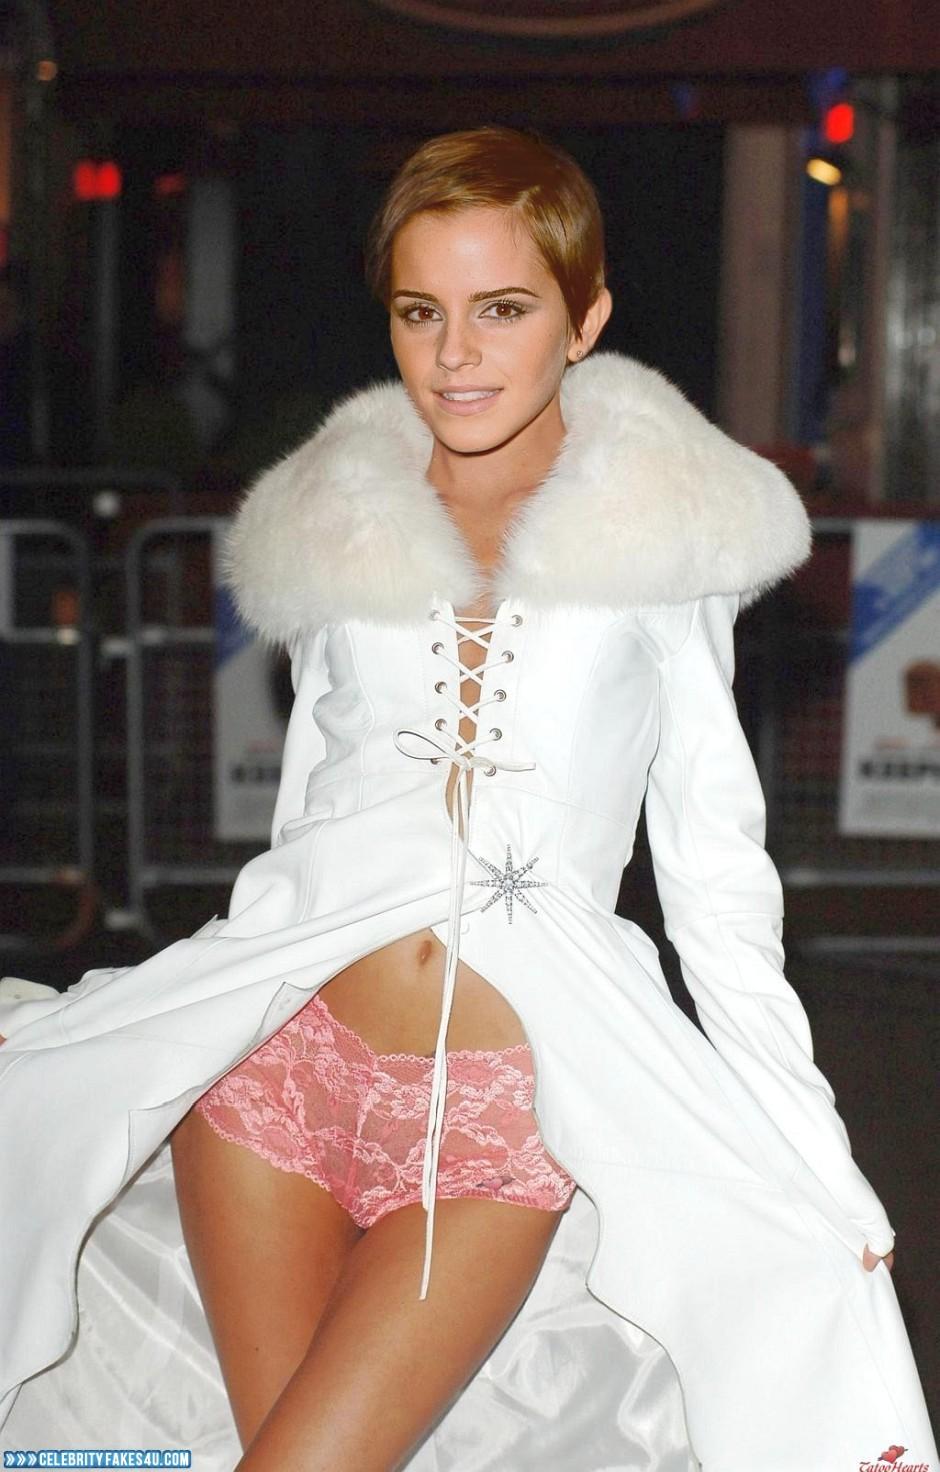 Female Nude In Public